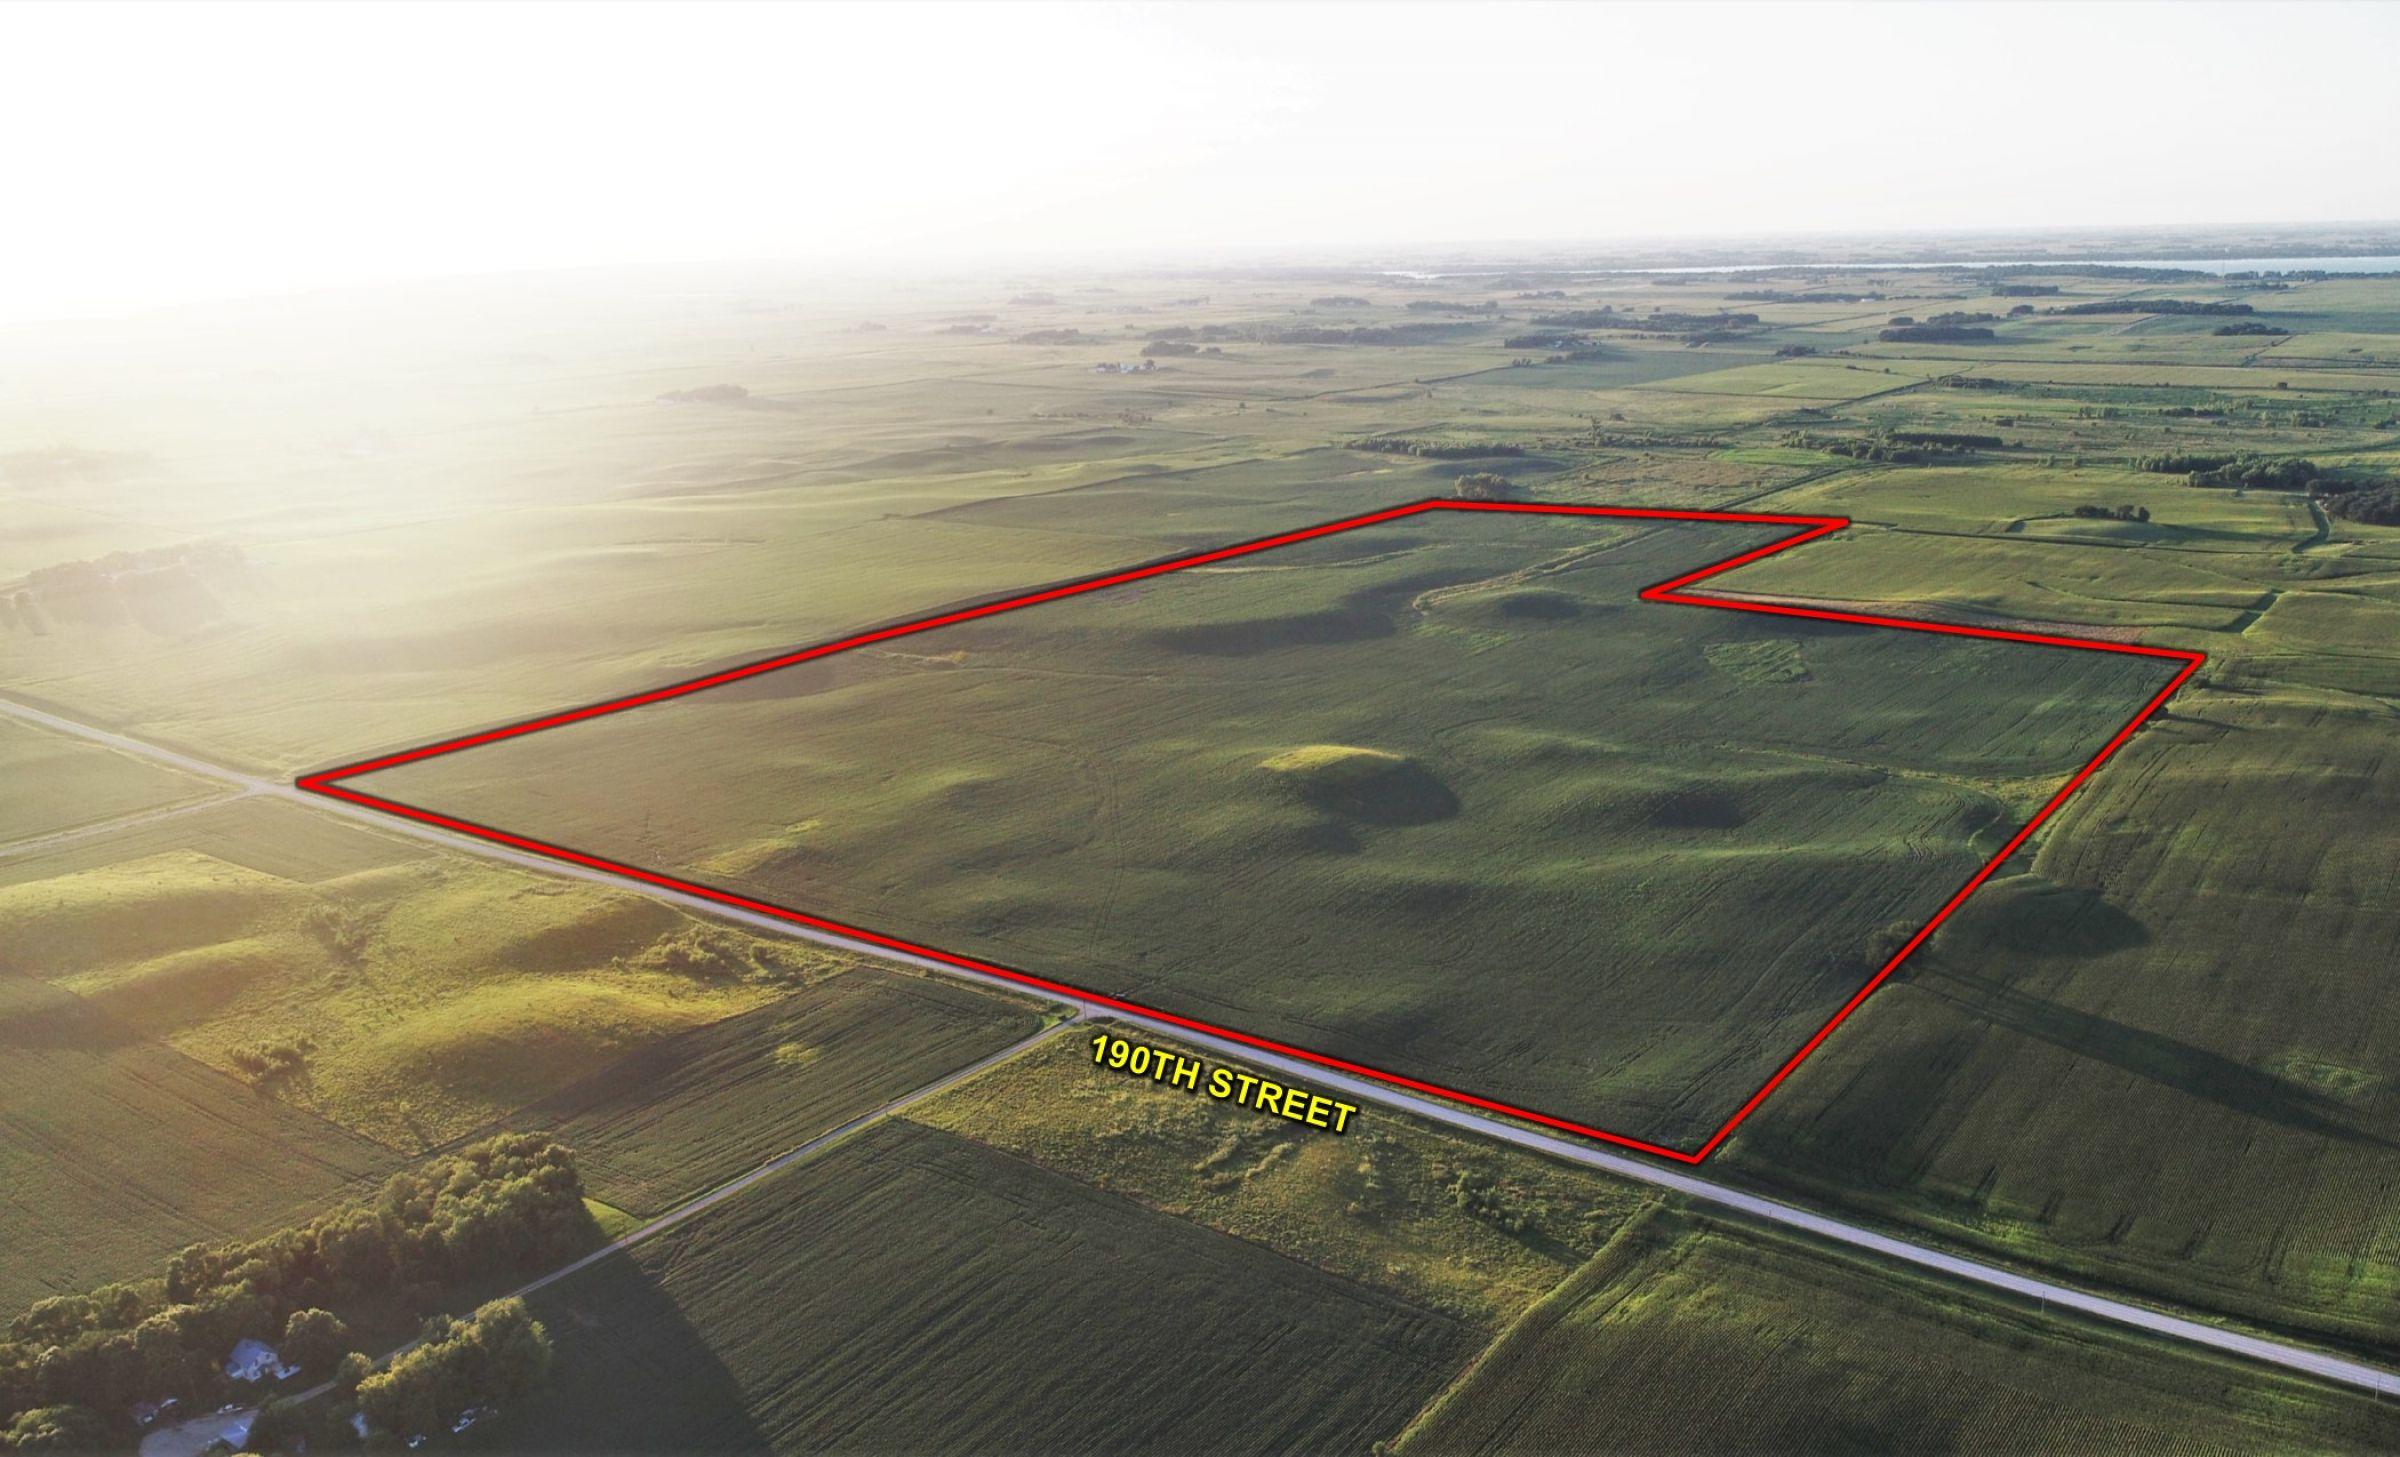 14763-cerro-gordo-farmland-for-sale-200-acres-ml-3-2019-11-07-180007.jpg